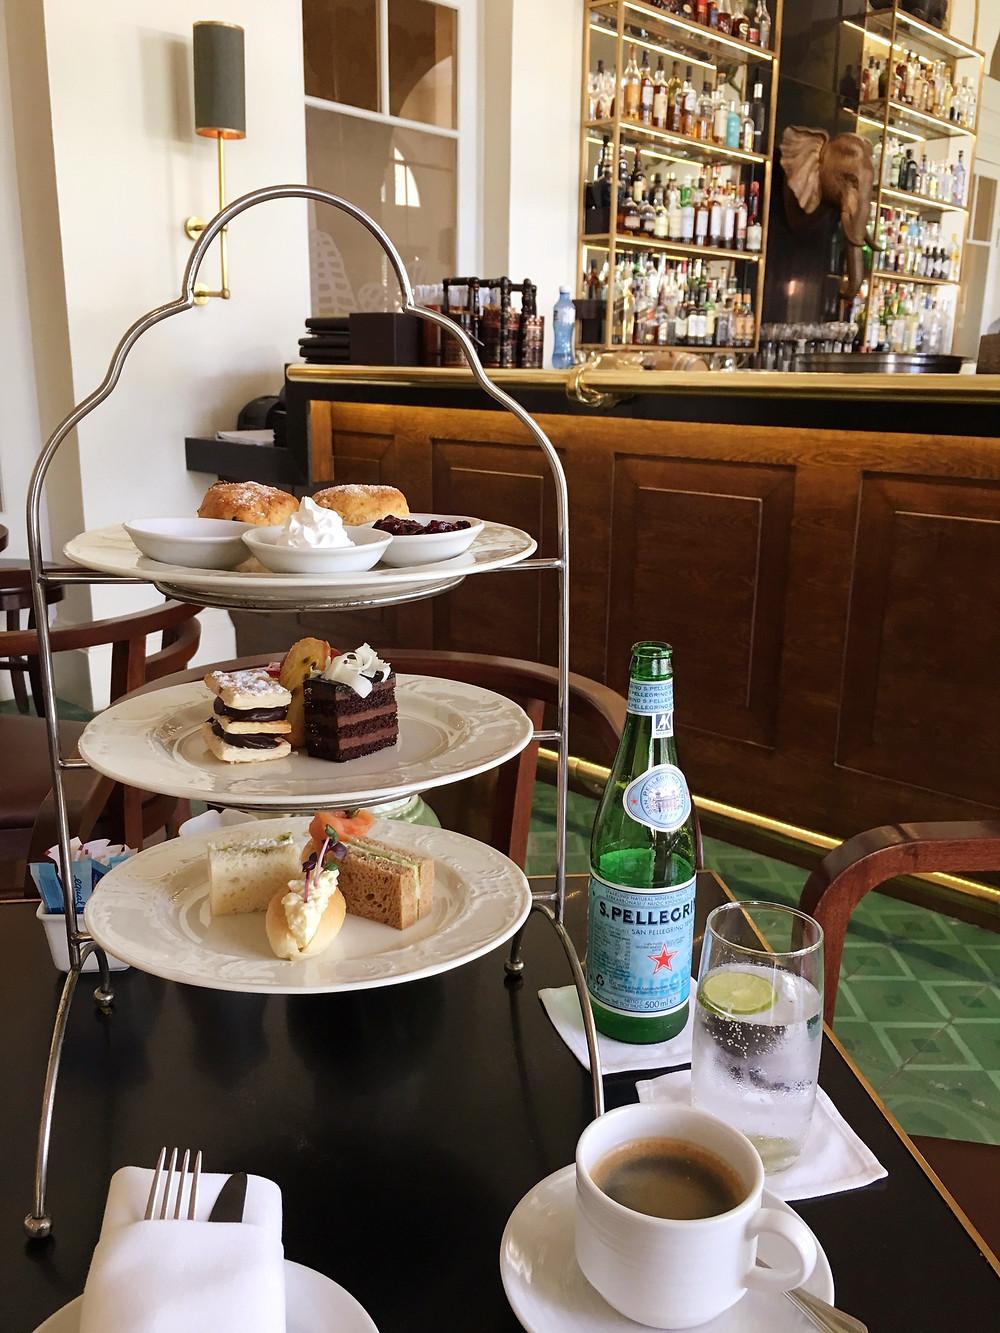 Afternoon tea at The Elephant Bar